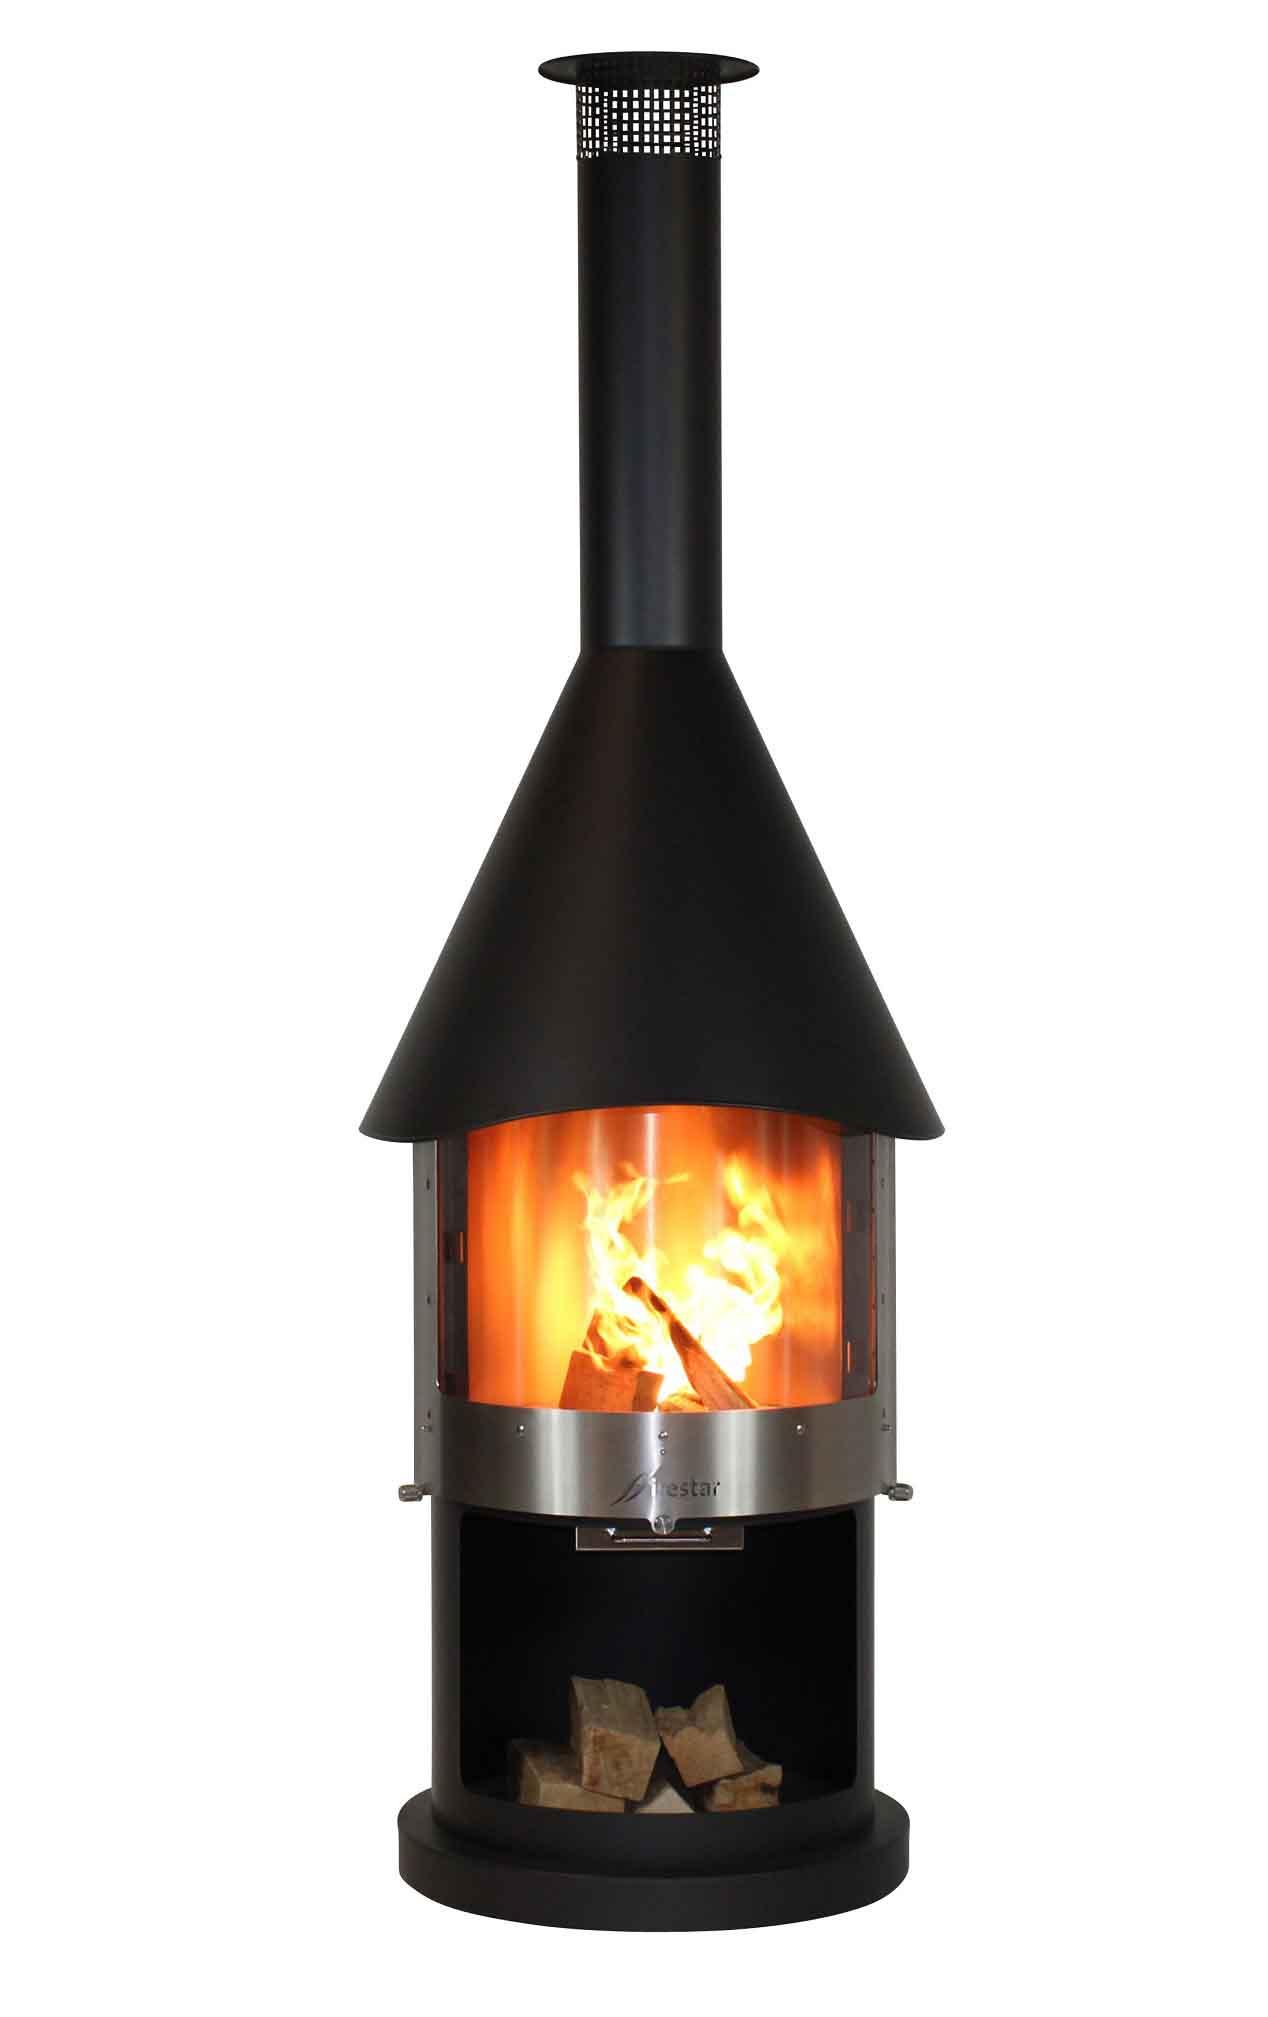 Cheminée De Jardin / Barbecue Firestar Dn 700 Swing Glas Classic serapportantà Cheminee De Jardin